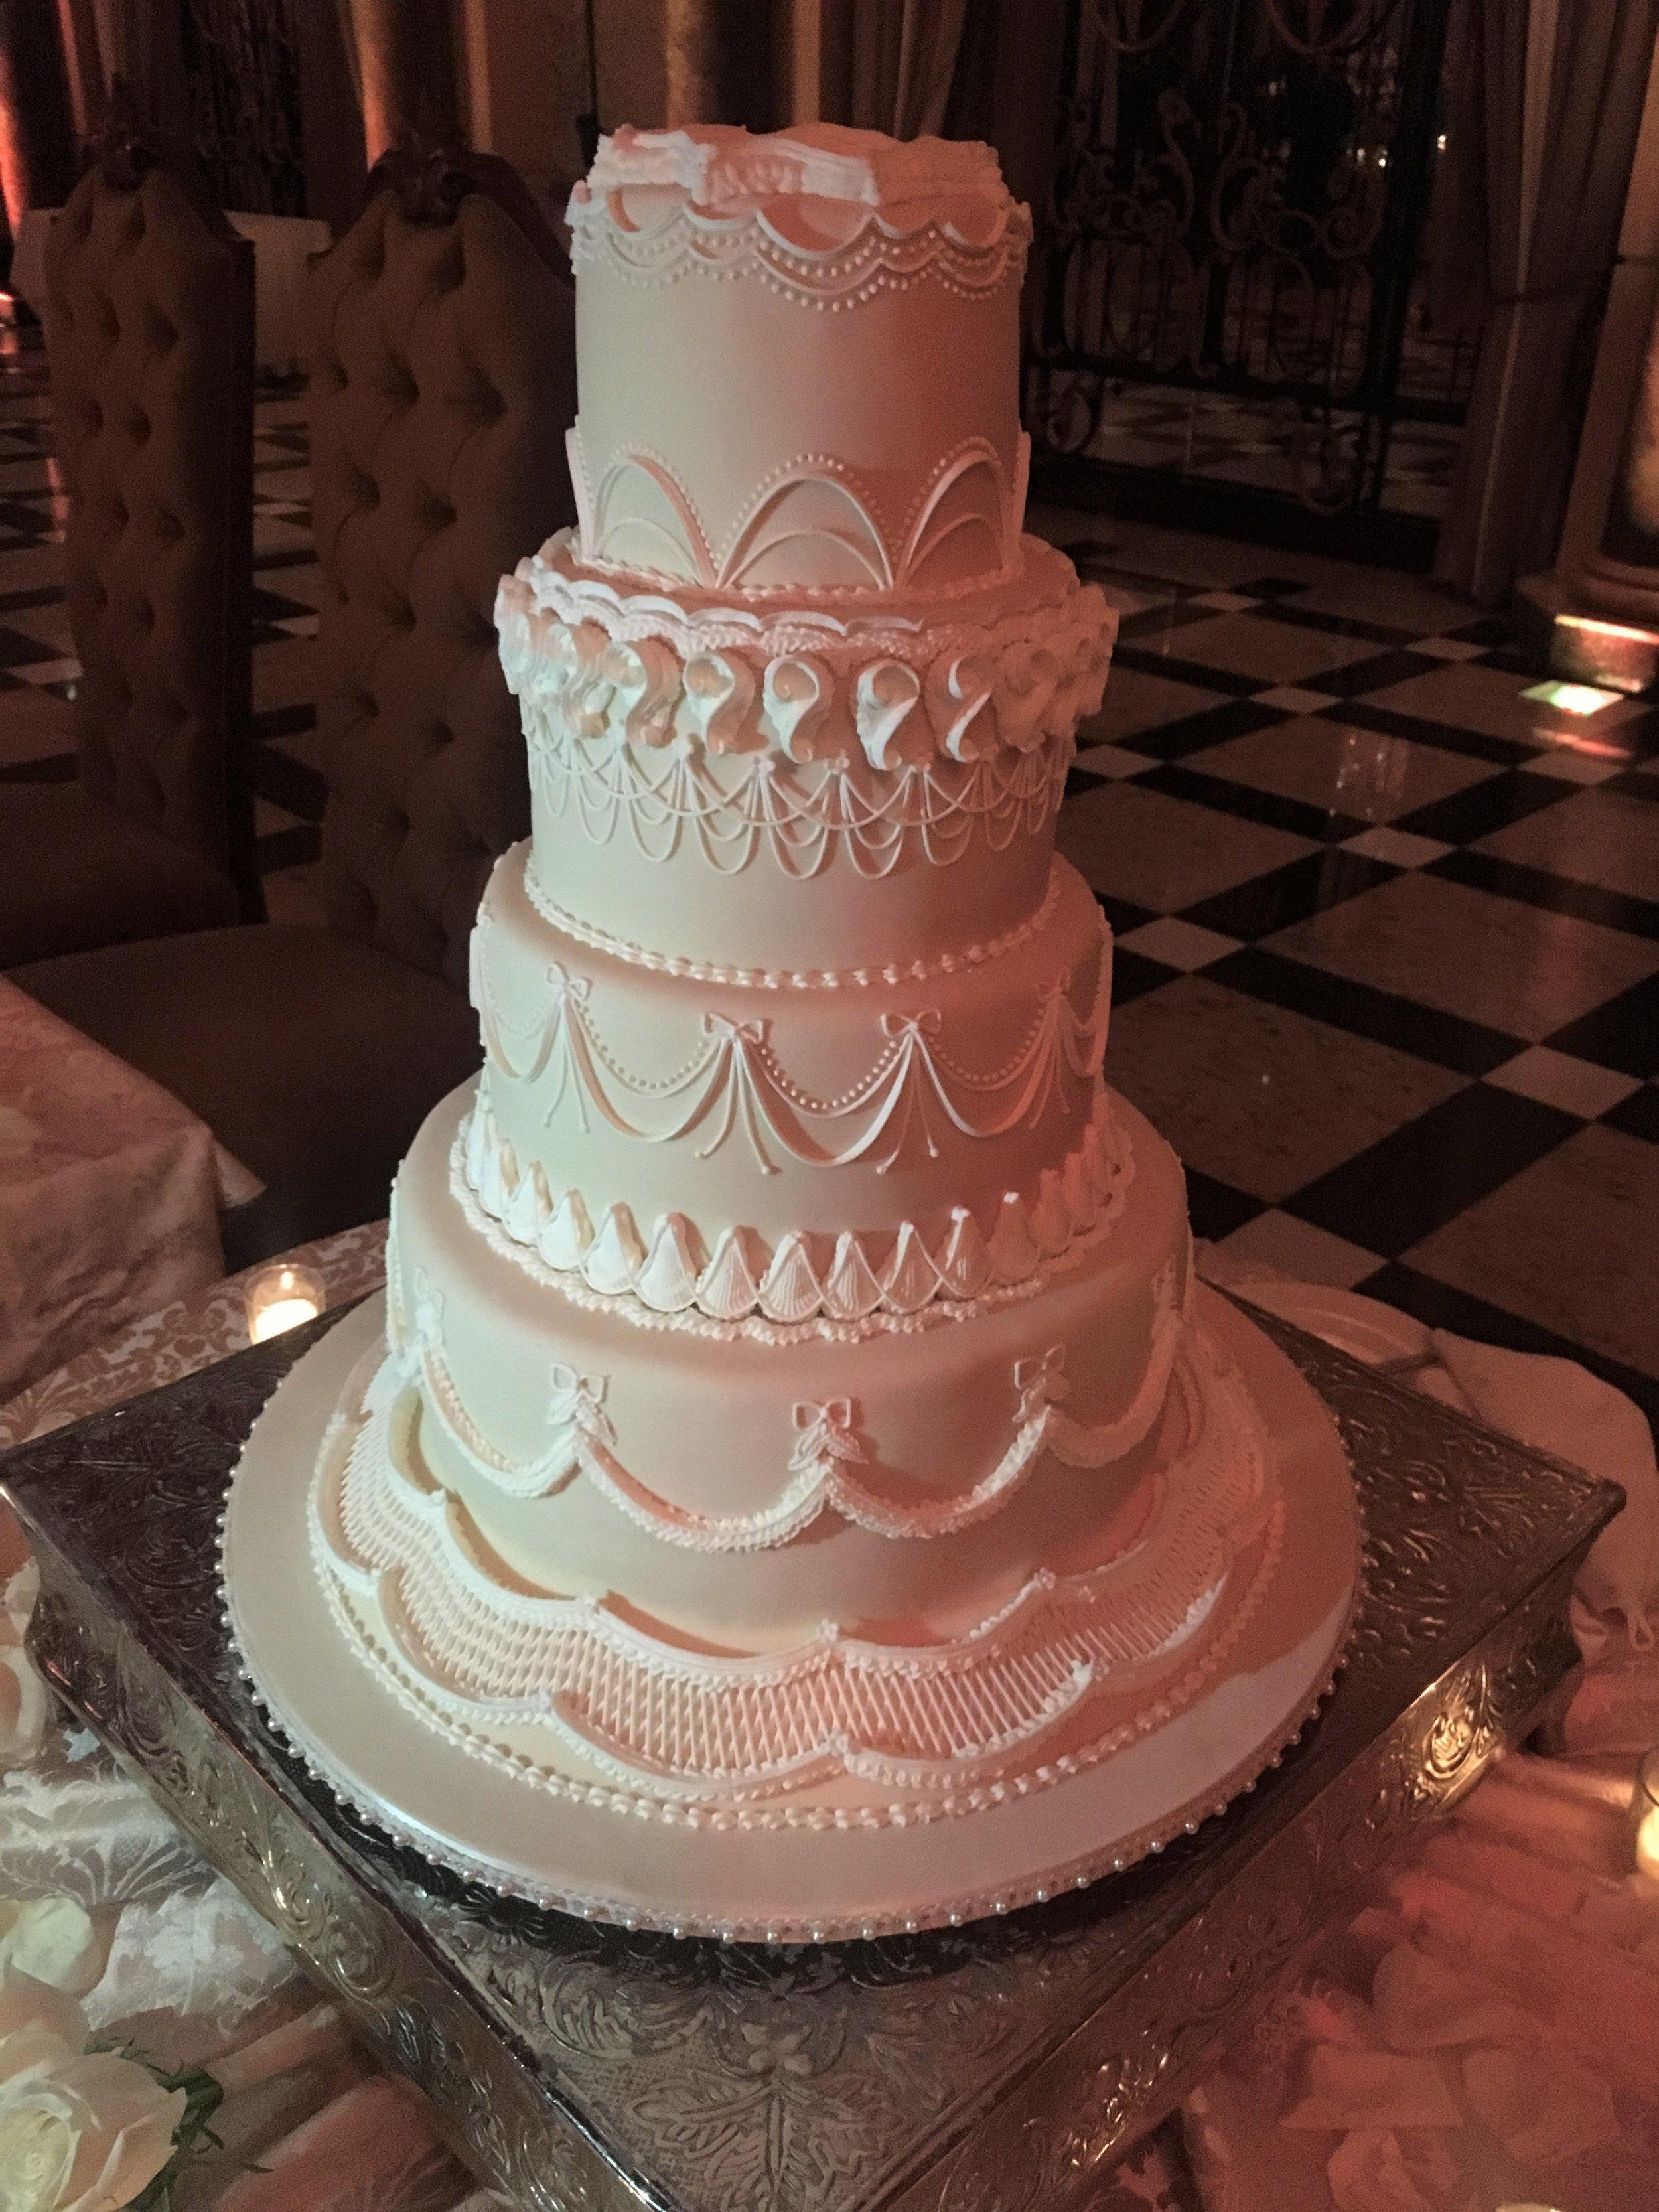 A classic wedding cake